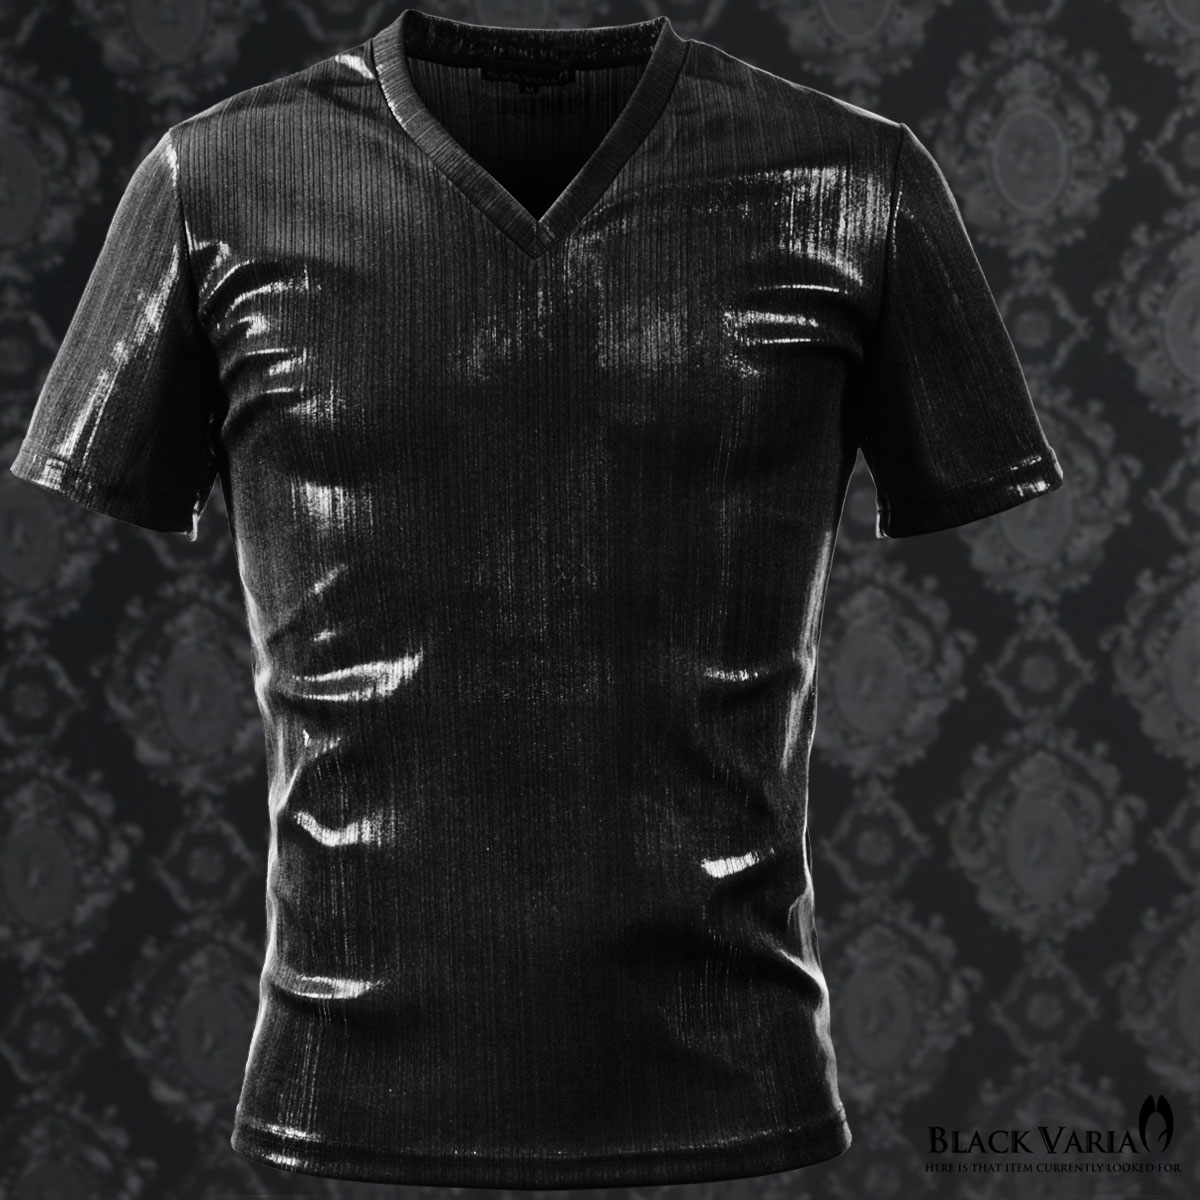 Tシャツ ラメ ストライプ Vネック 半袖 メンズ 日本製 細身 無地 光沢 箔プリント 半袖Tシャツ(ブラック黒)